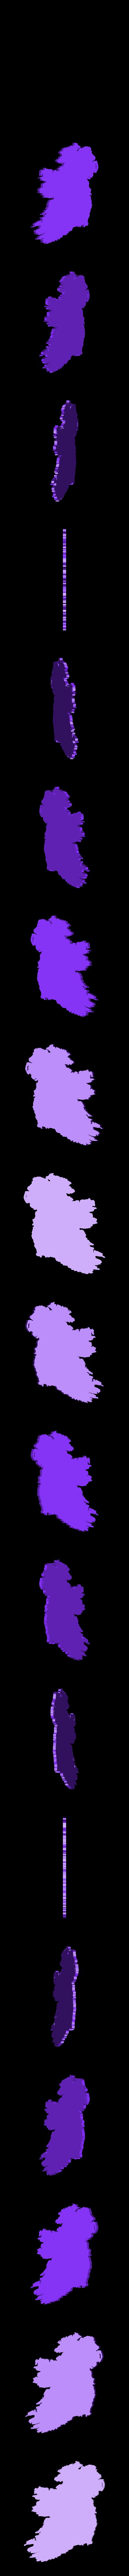 ireland.stl Download free STL file Ireland Map • 3D printer model, 3DME